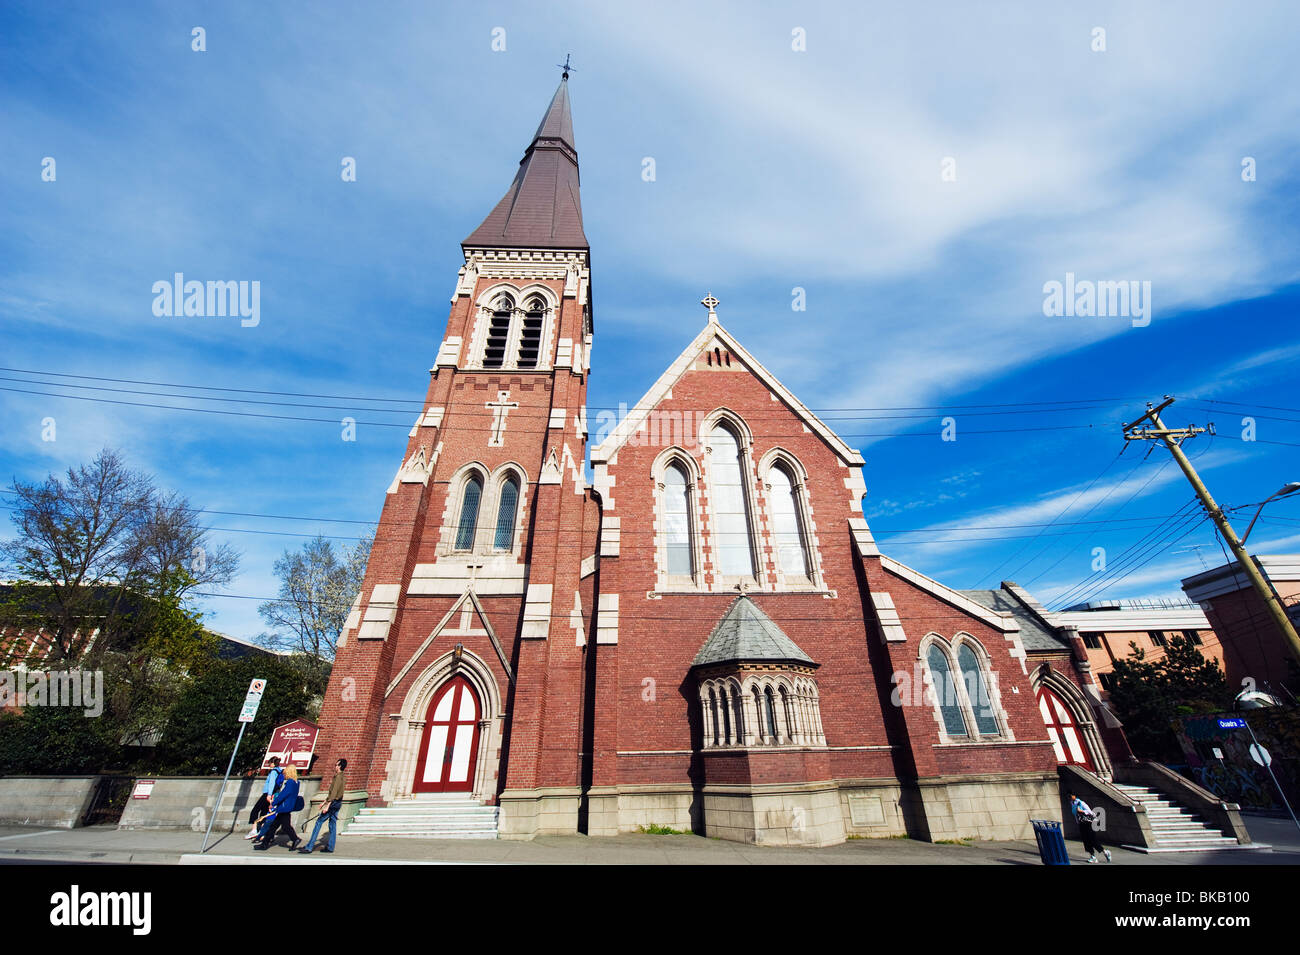 Church of St John the Divine, Victoria, Vancouver Island, British Columbia, Canada - Stock Image